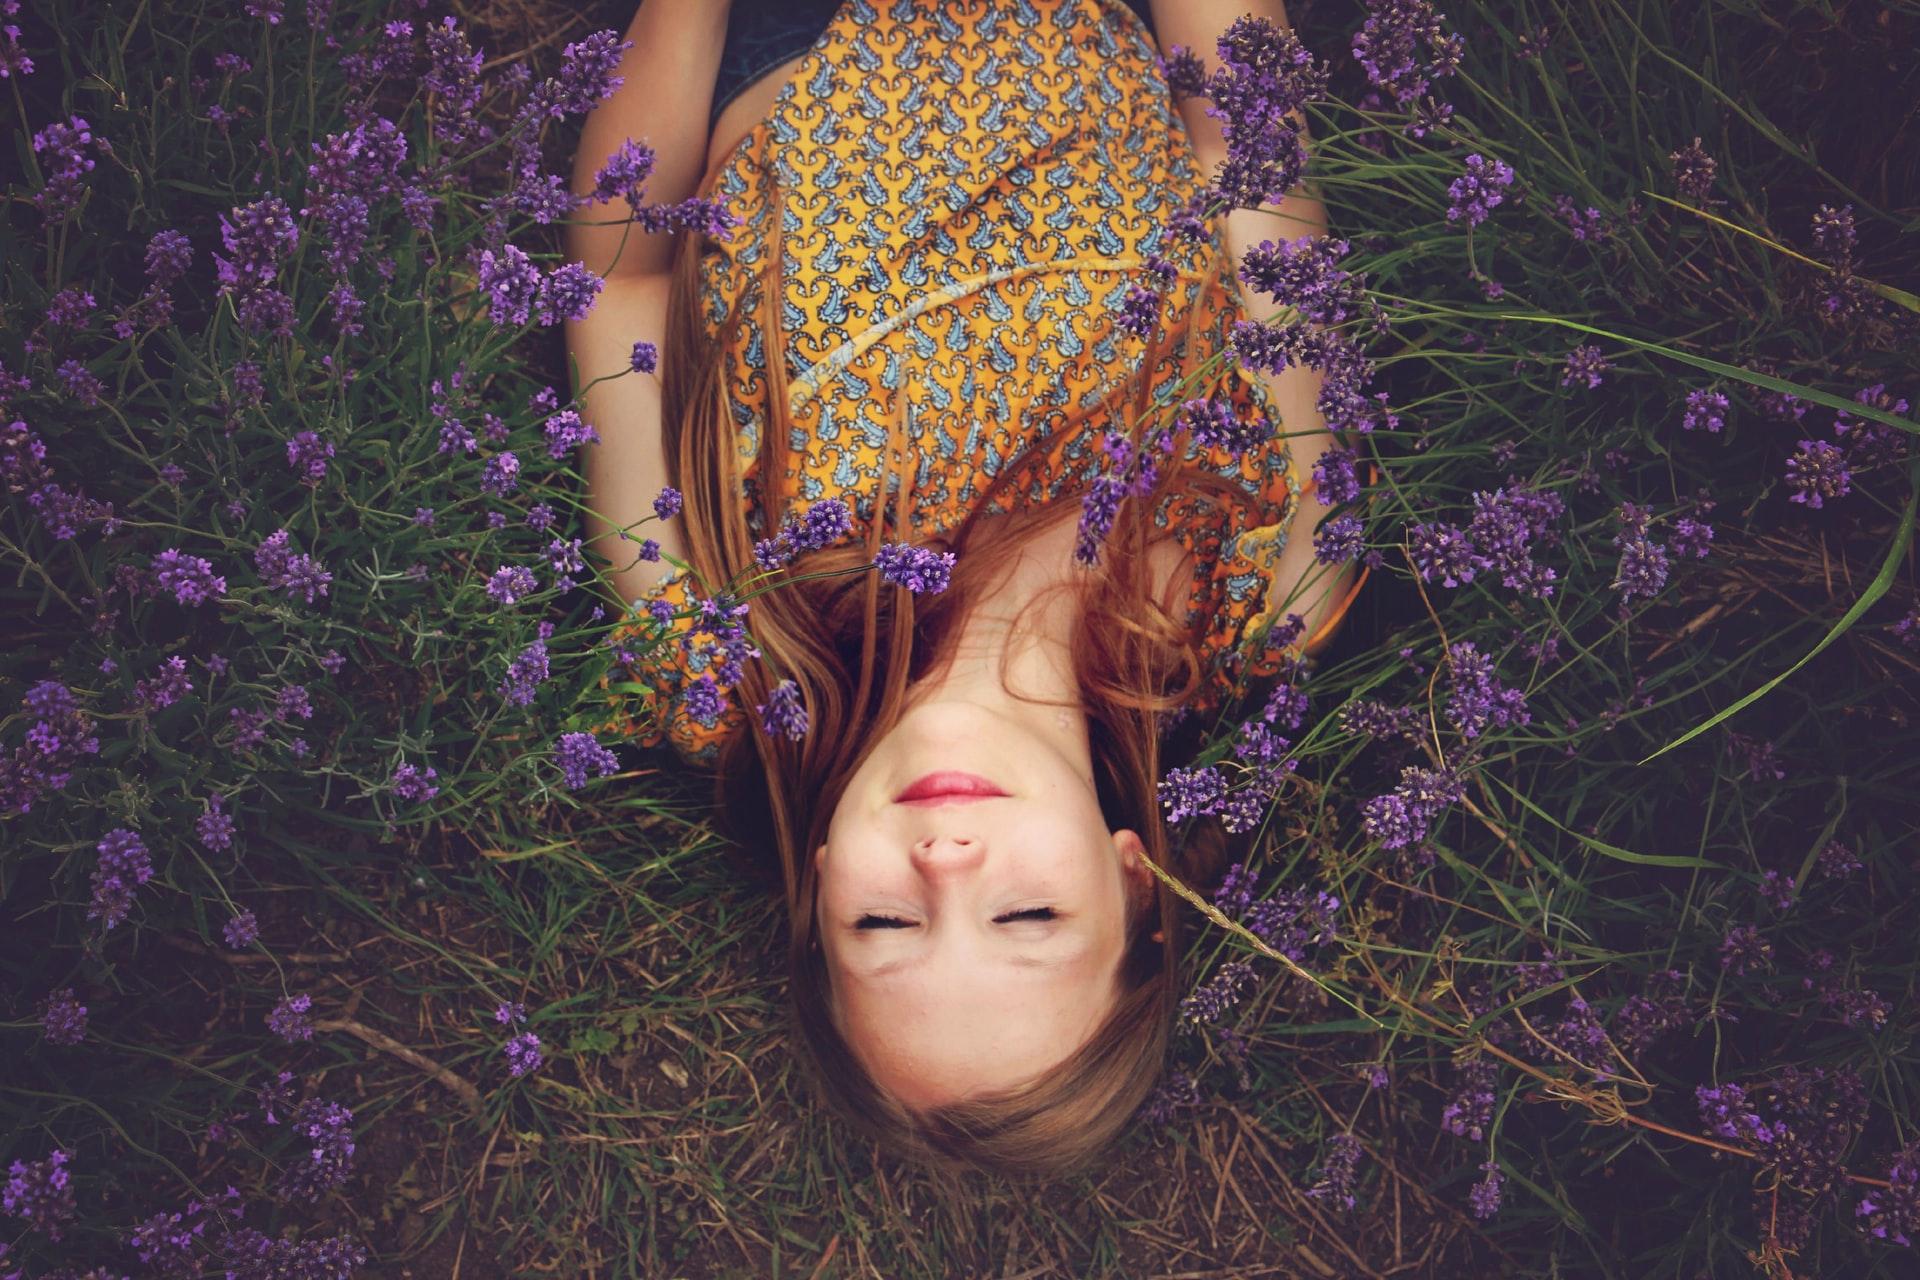 'Niksen' als levenskunst tegen stress